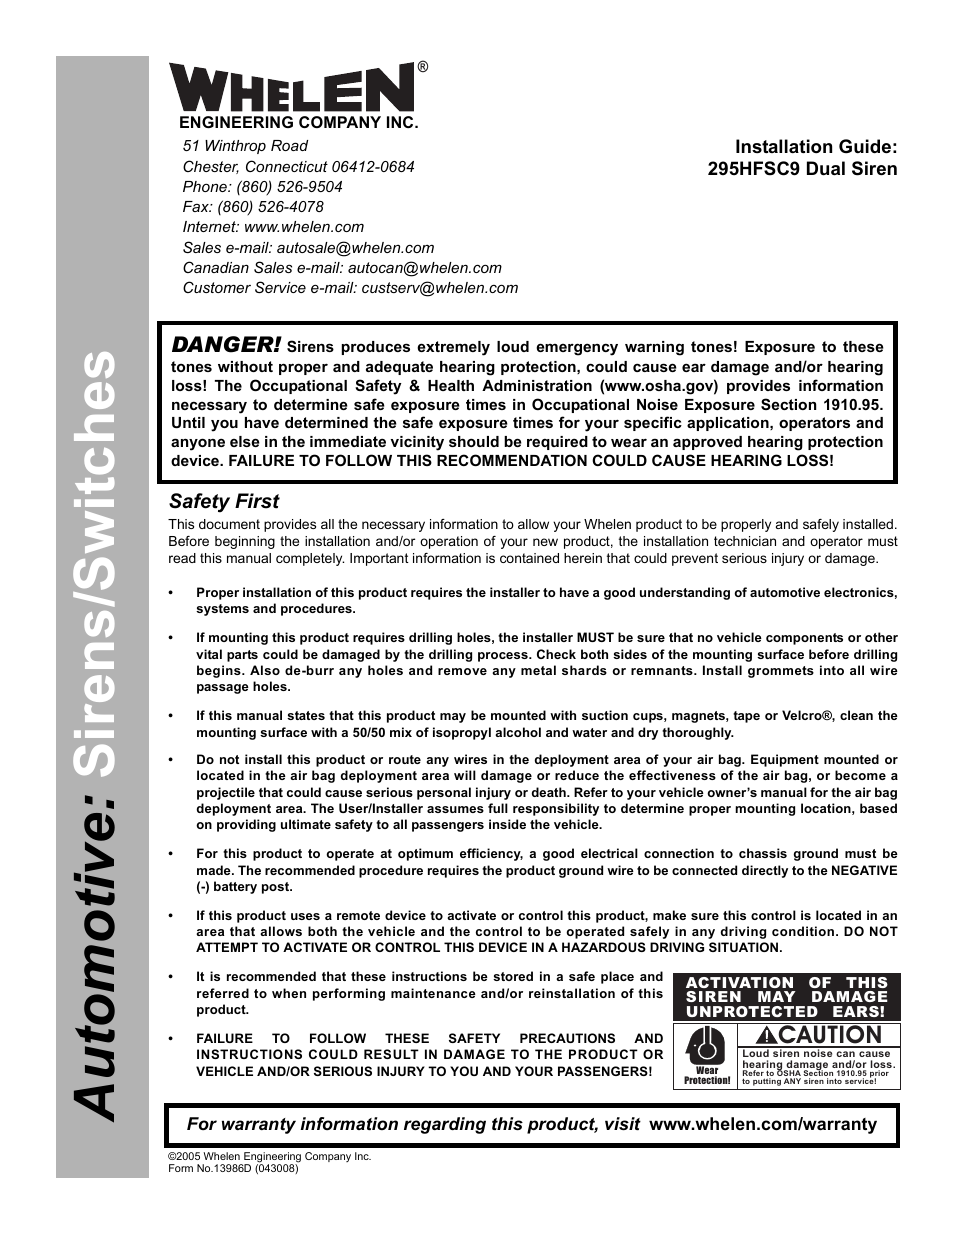 Whelen 295hfsc9 User Manual